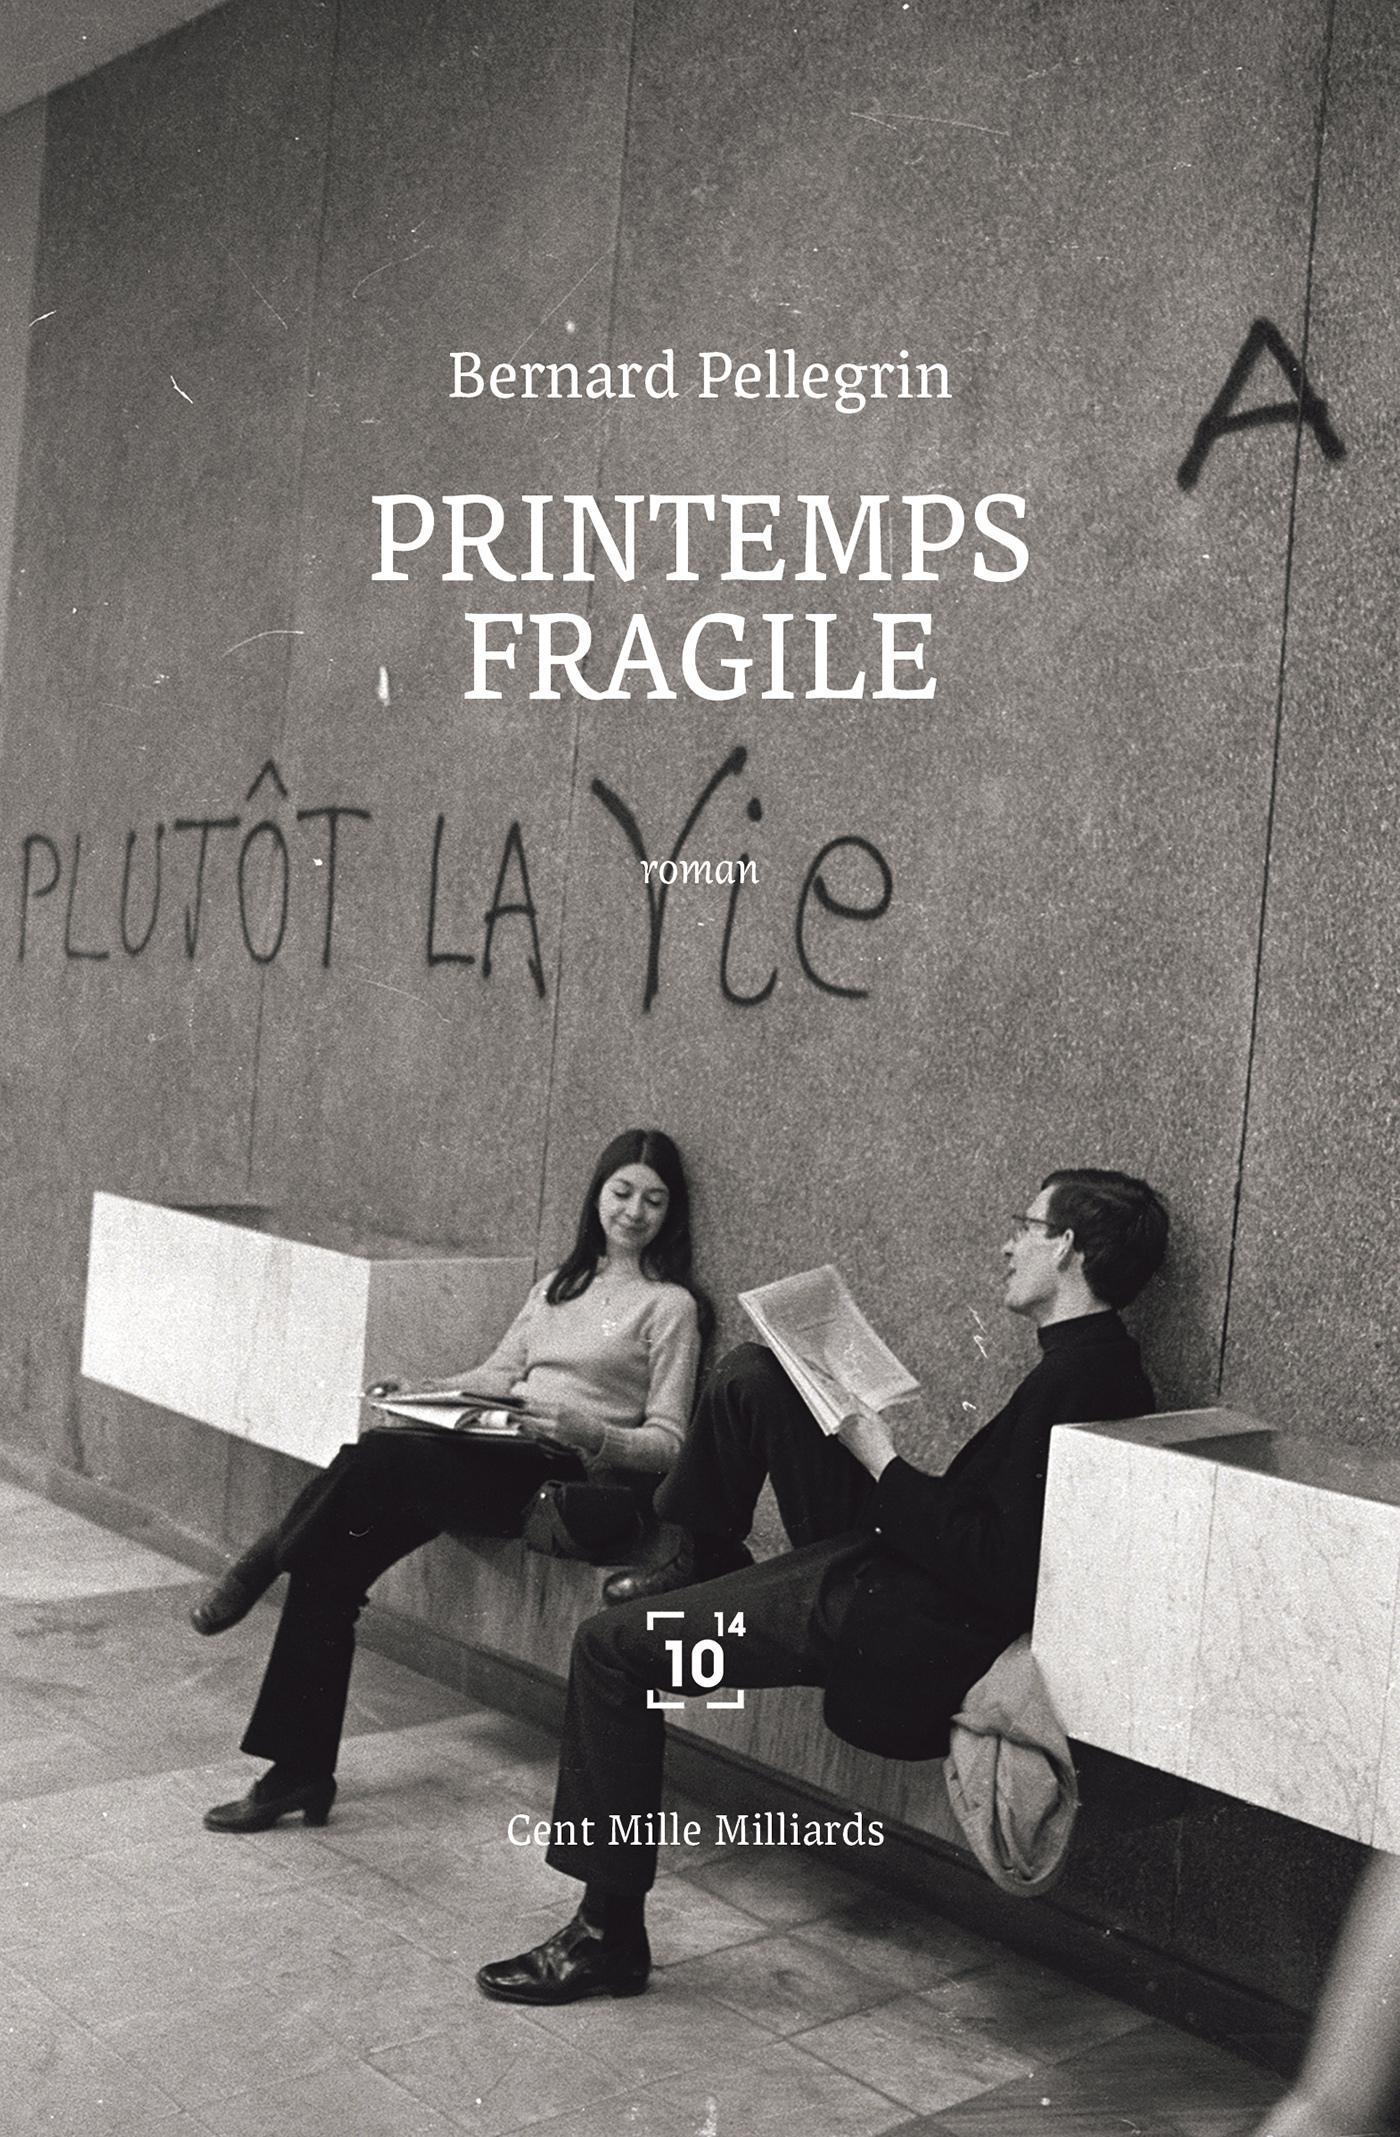 PRINTEMPS FRAGILE